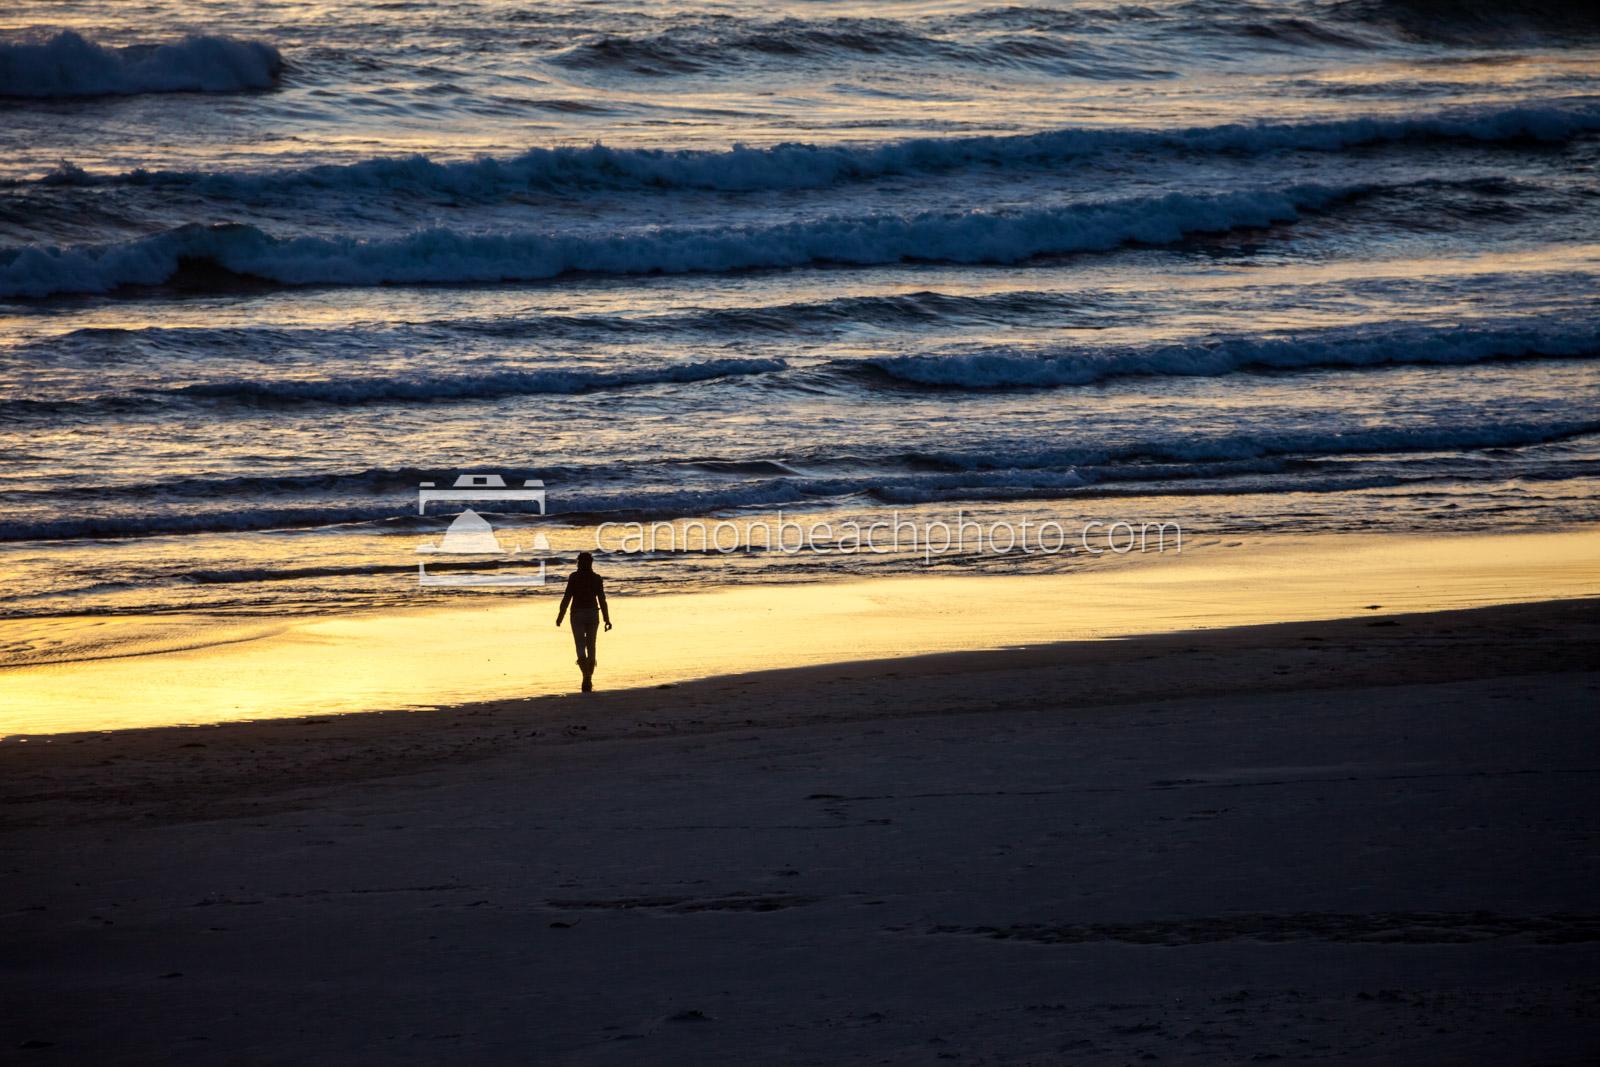 Sunset Strolling the Shoreline 1